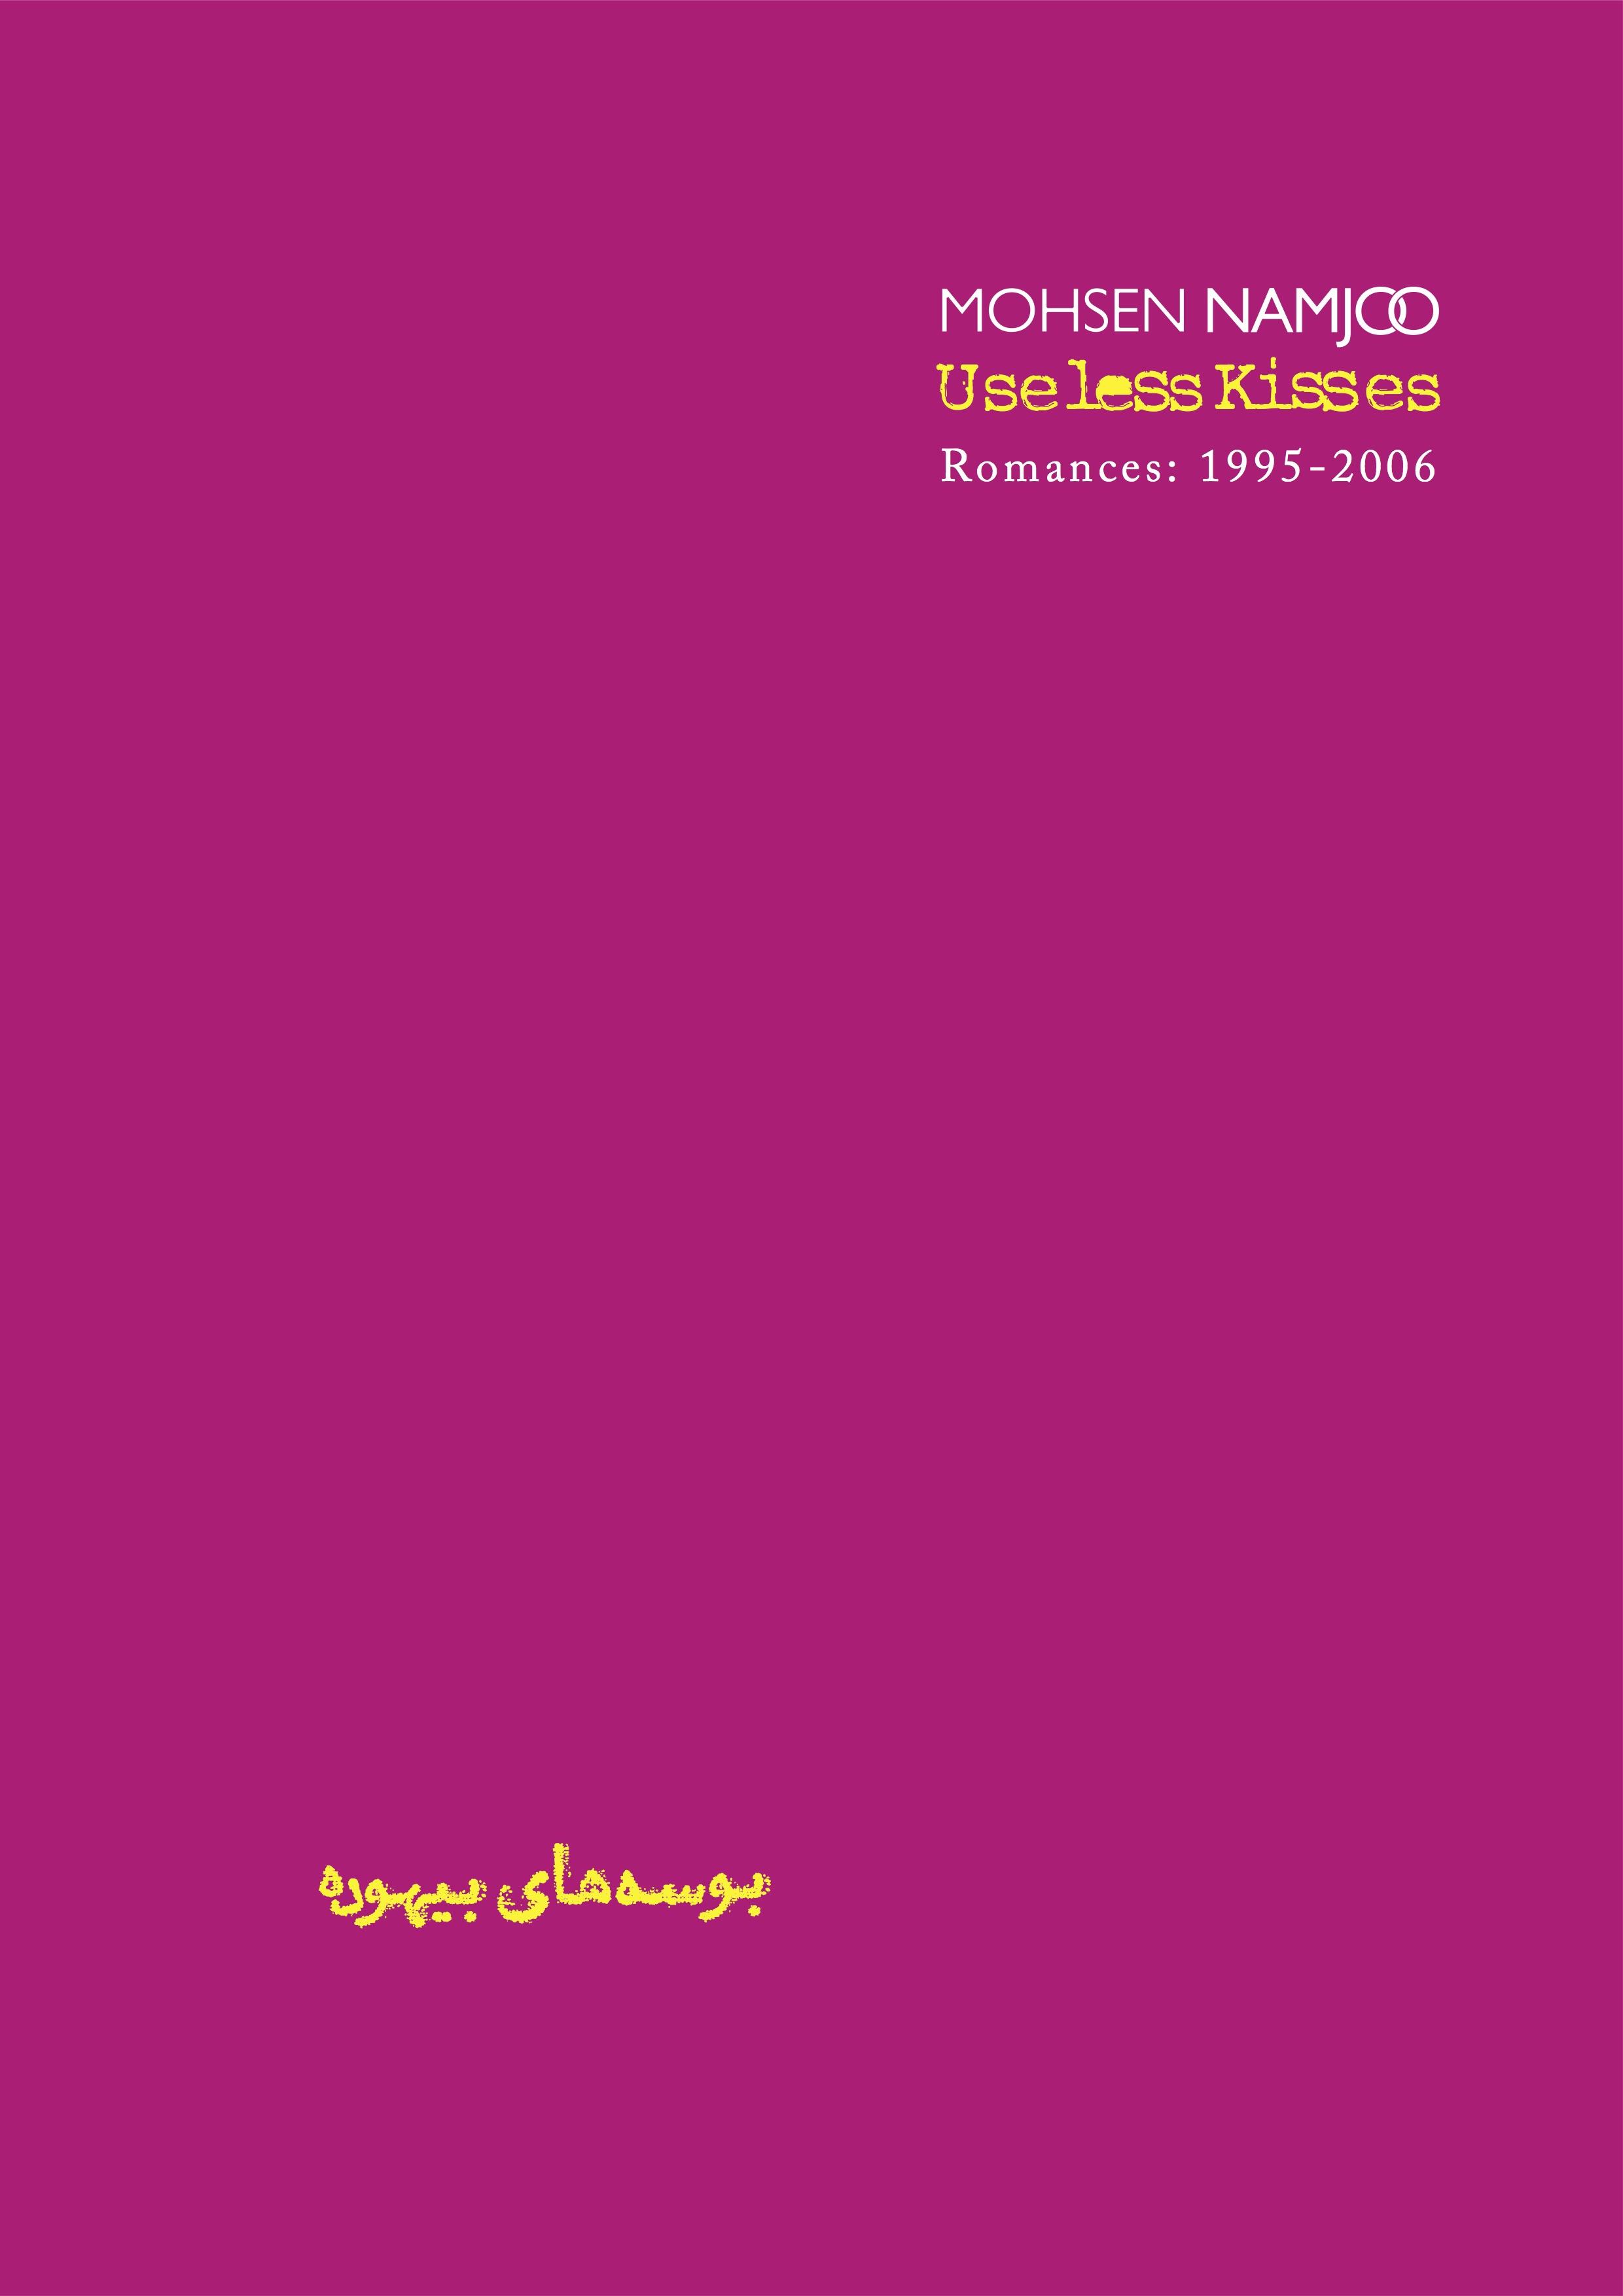 00Useless Kisses eBook (2nd Edition).jpg